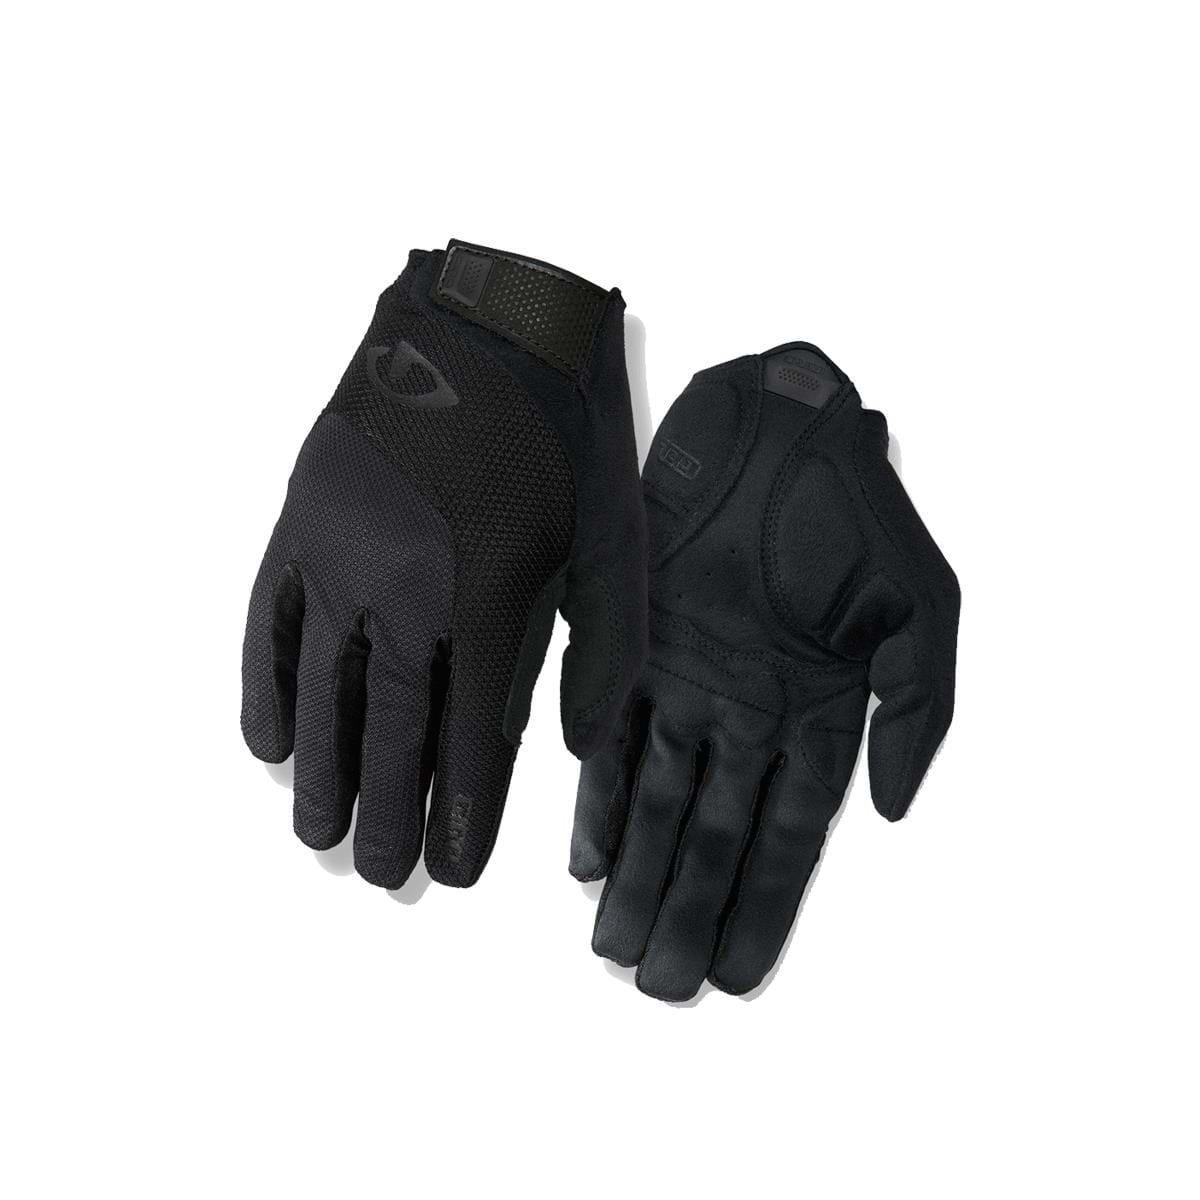 Bravo Gel LF Road Cycling Glove